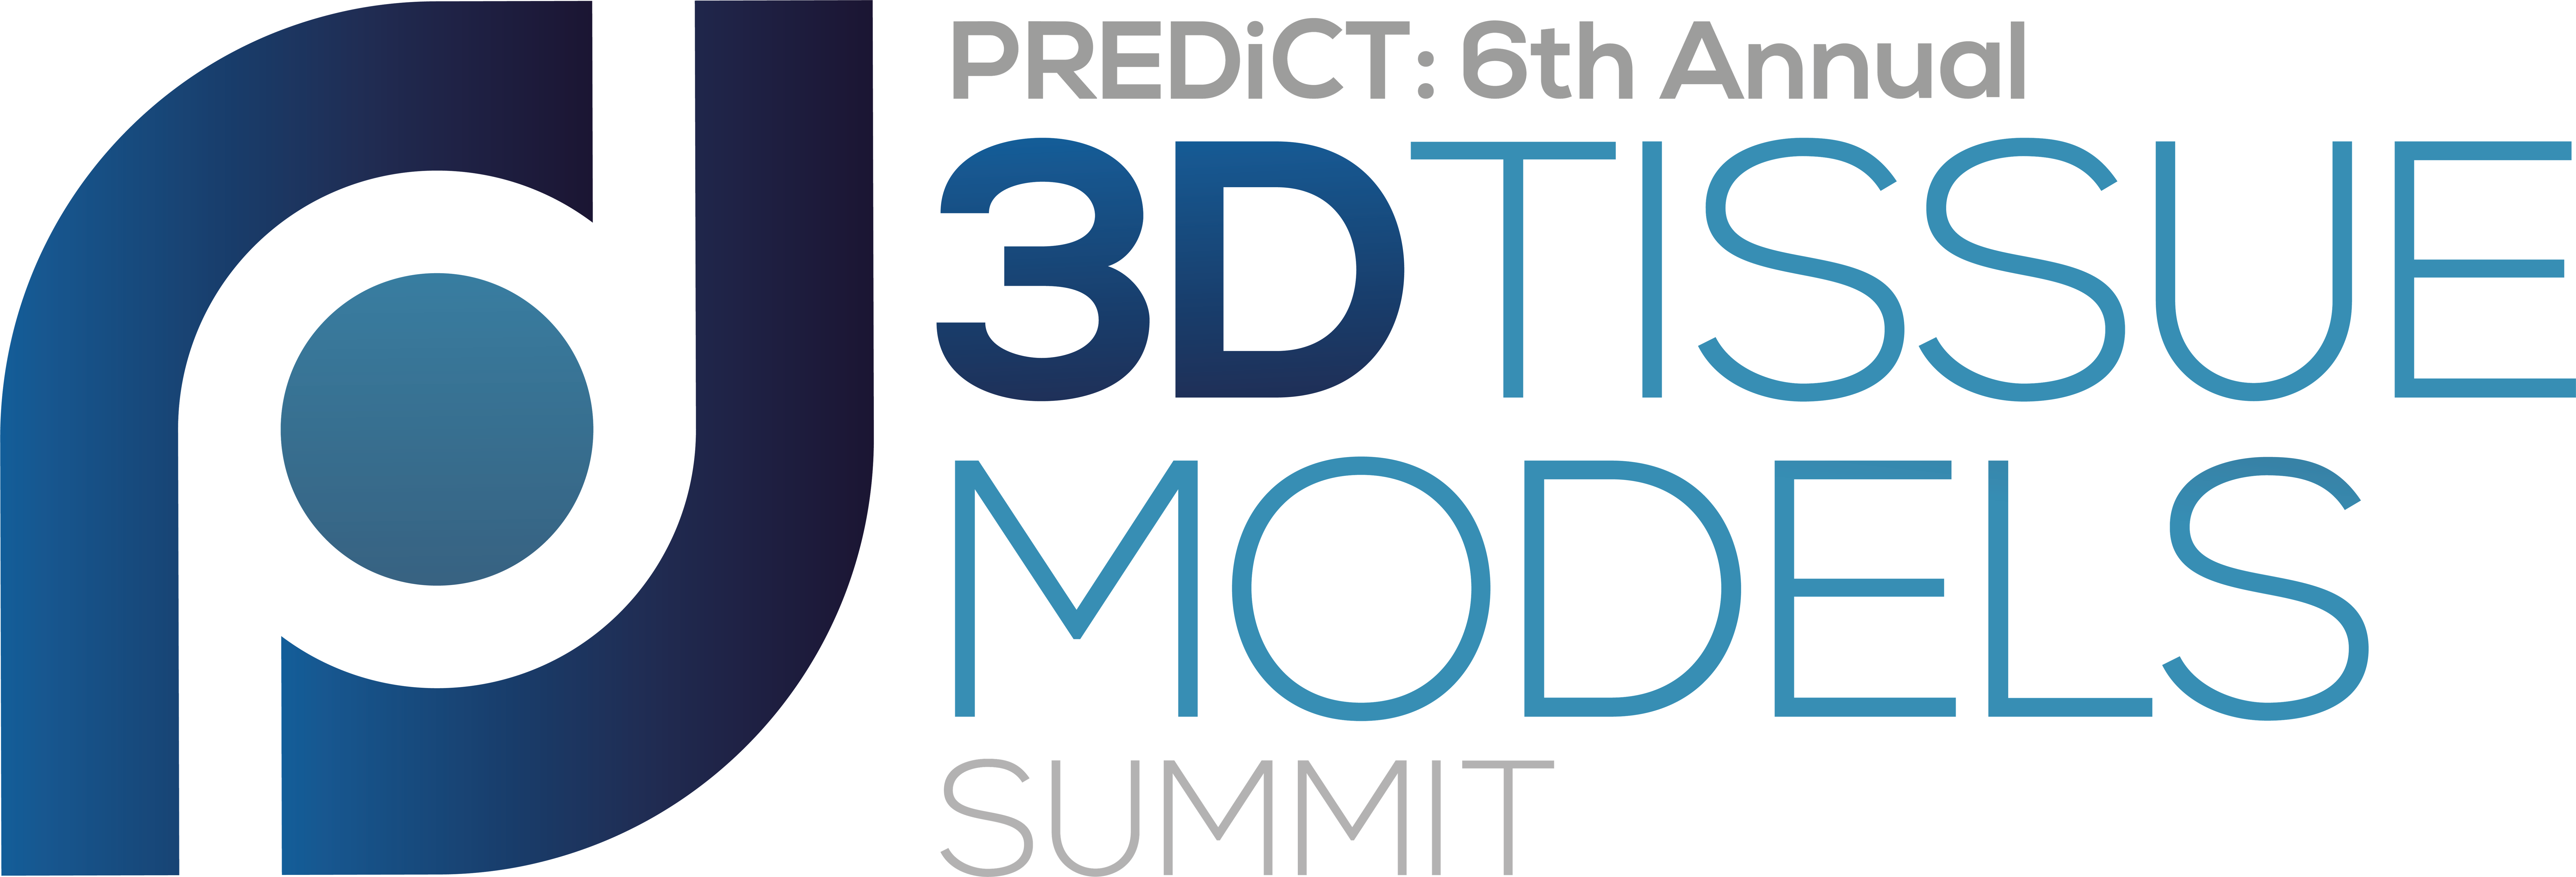 20326 - 3D Tissue Models Summit